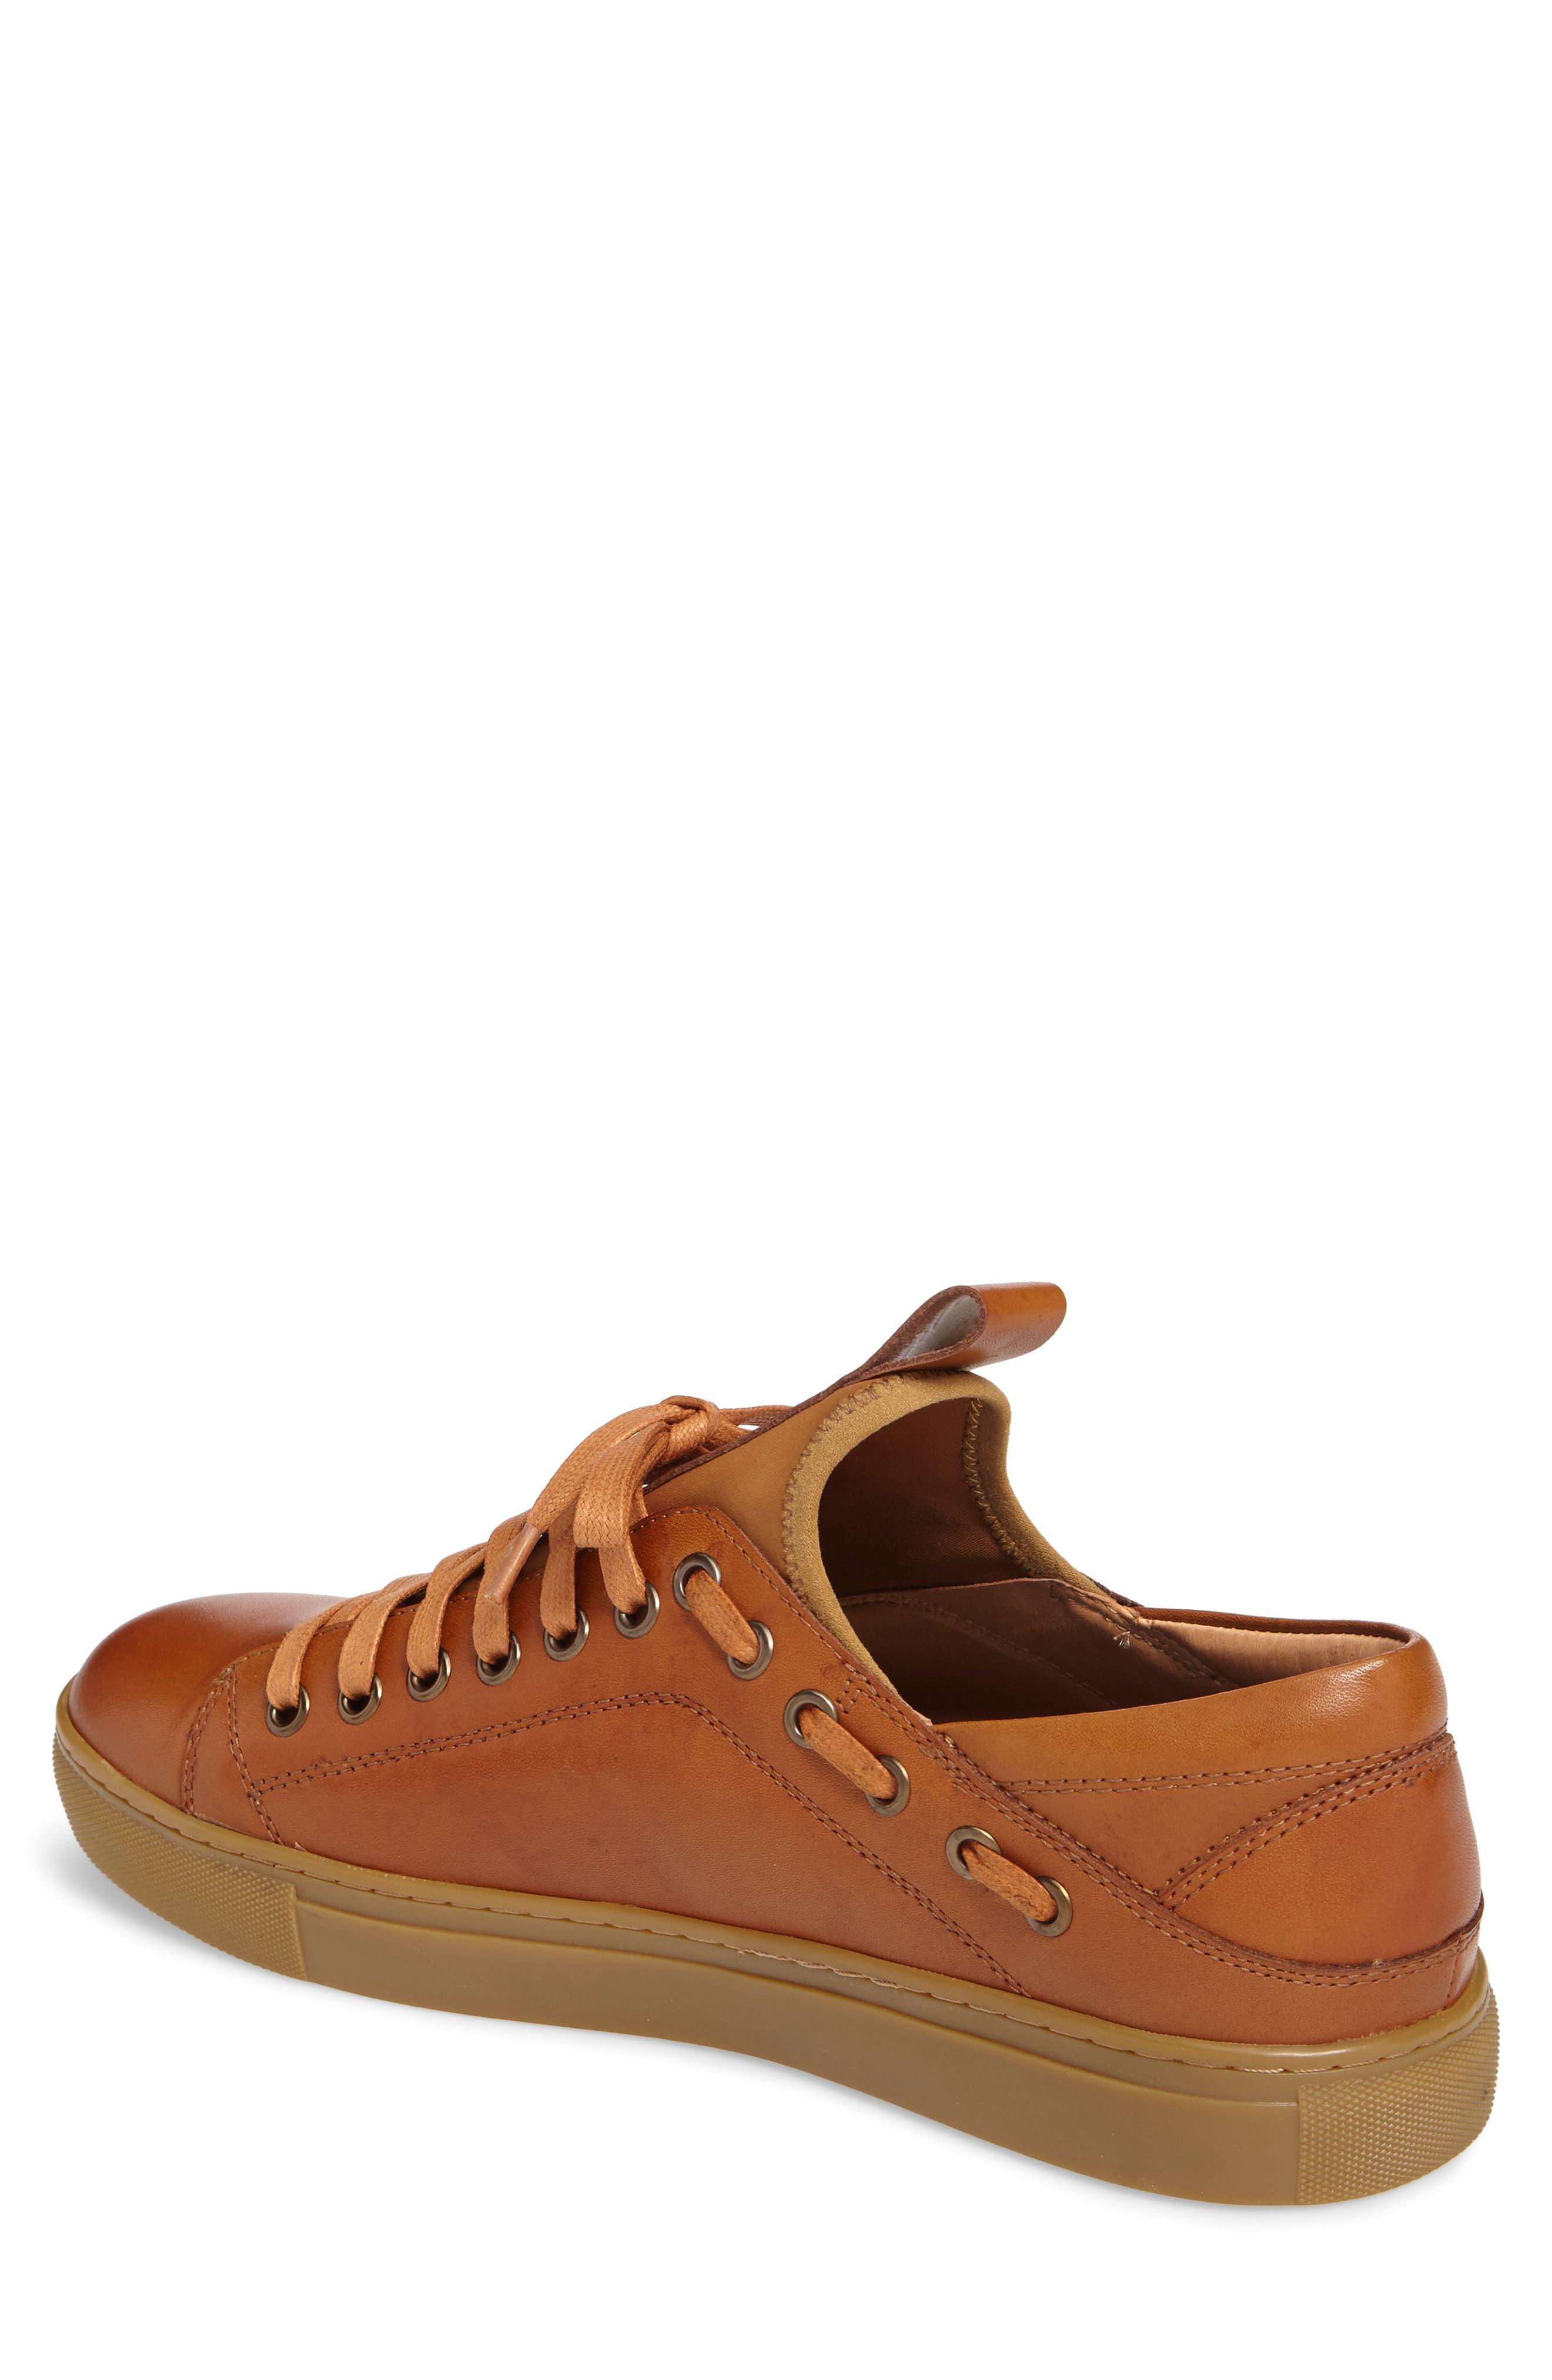 Alternate Image 2  - Zanzara Owen Sneaker (Men)